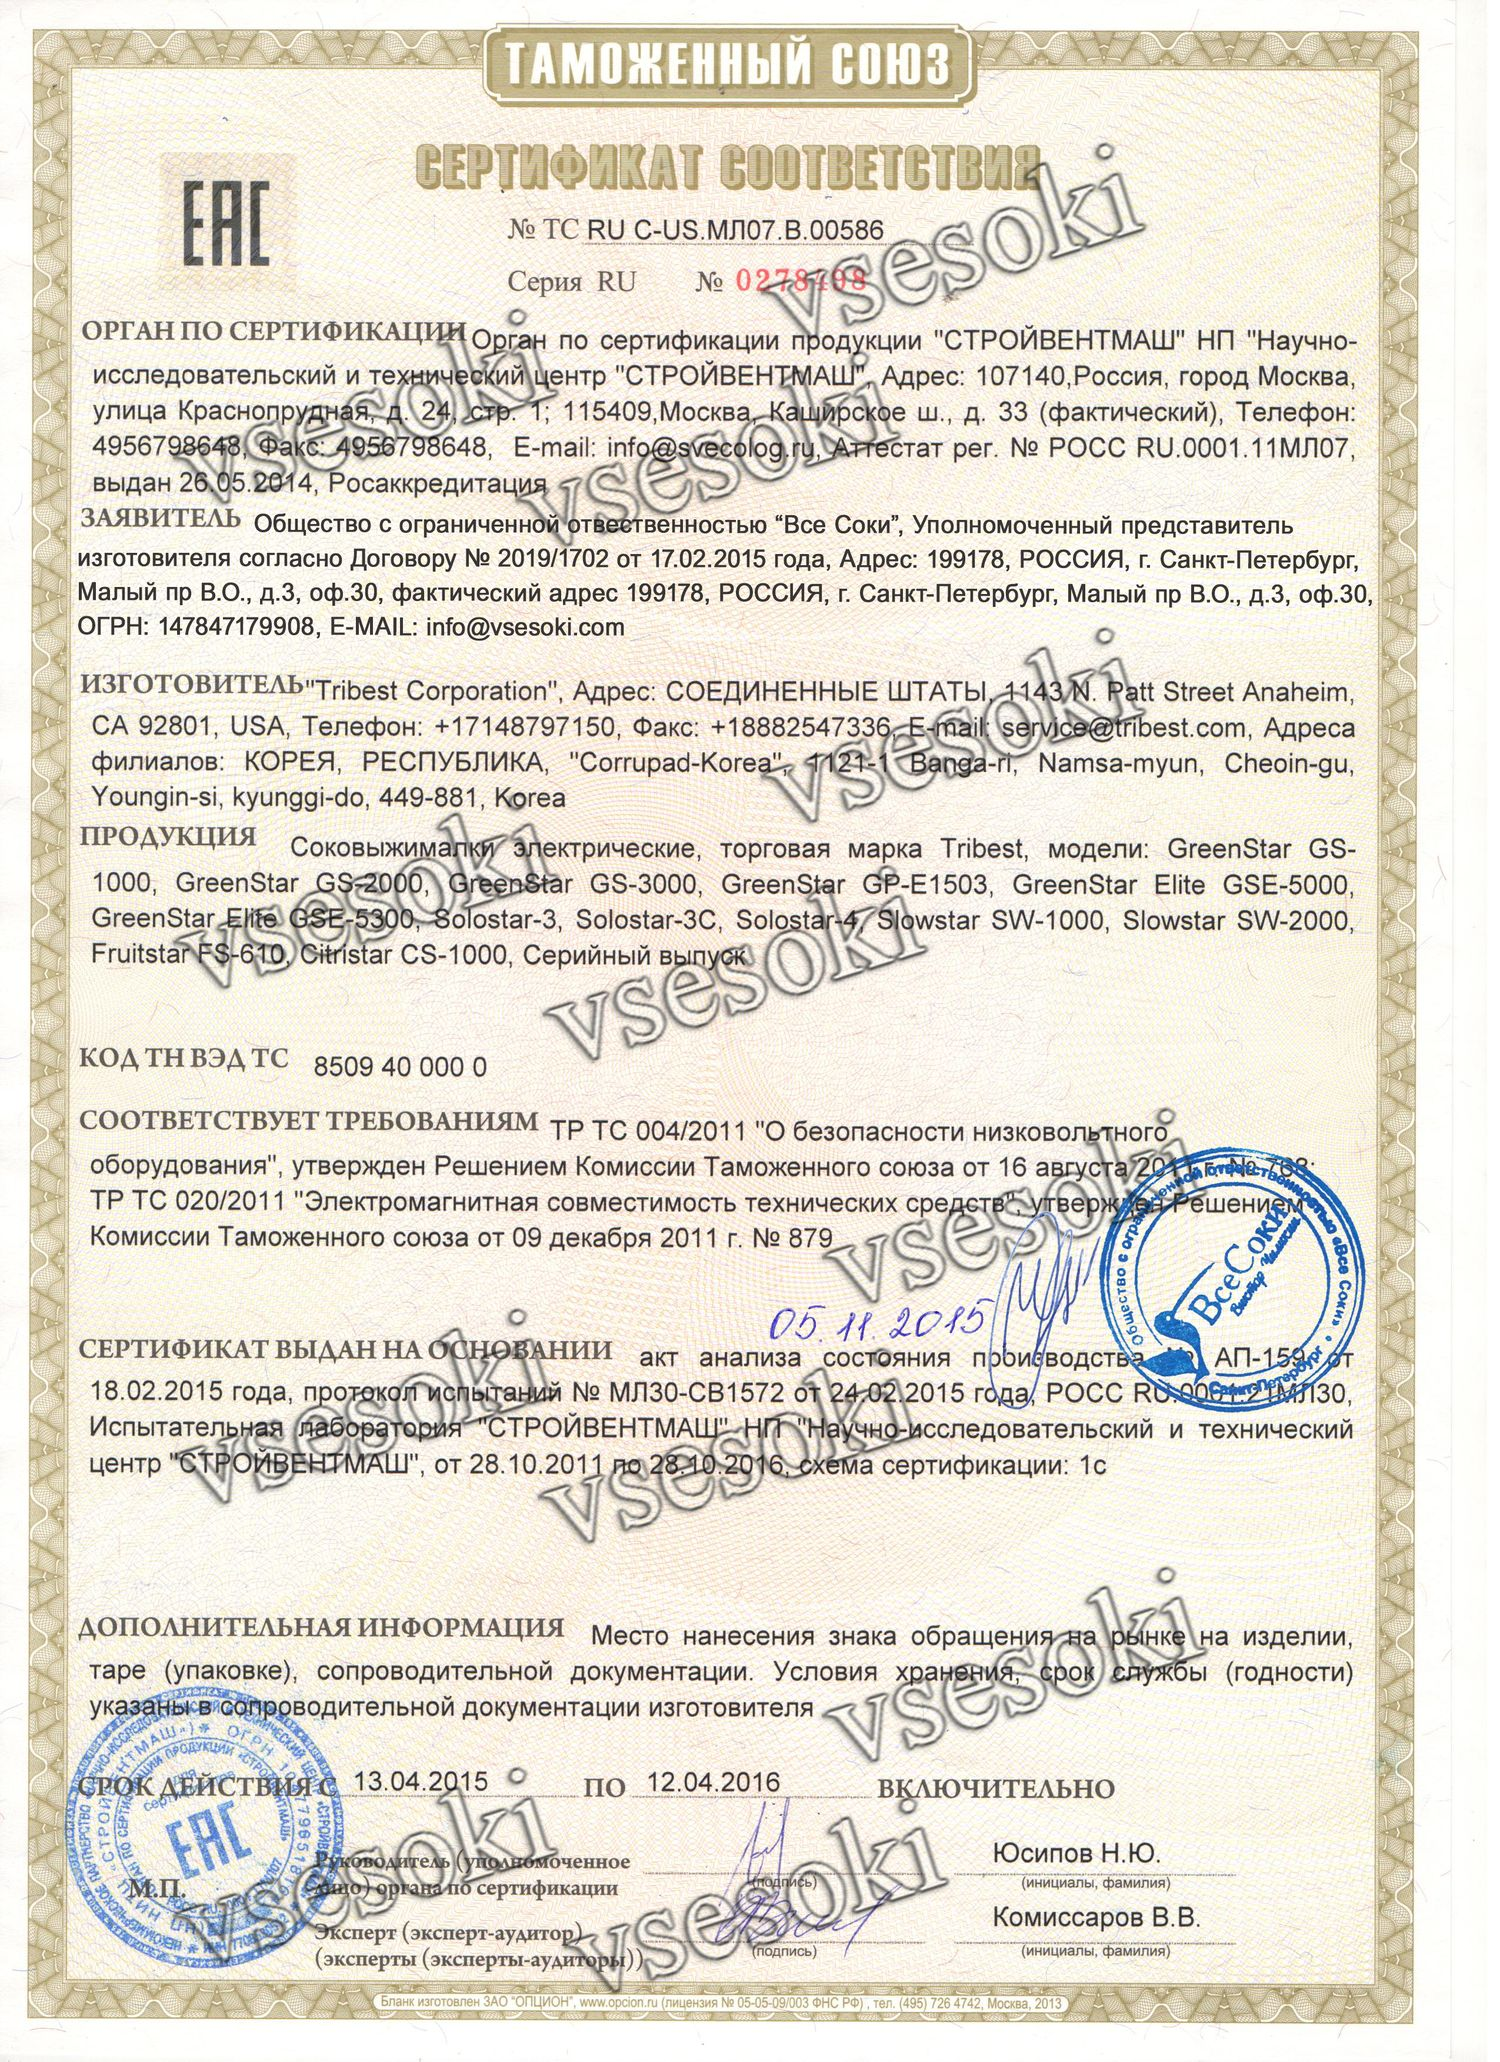 Sertifikat_EAC_Tribest_-_sokovigimalki2_1_.jpg